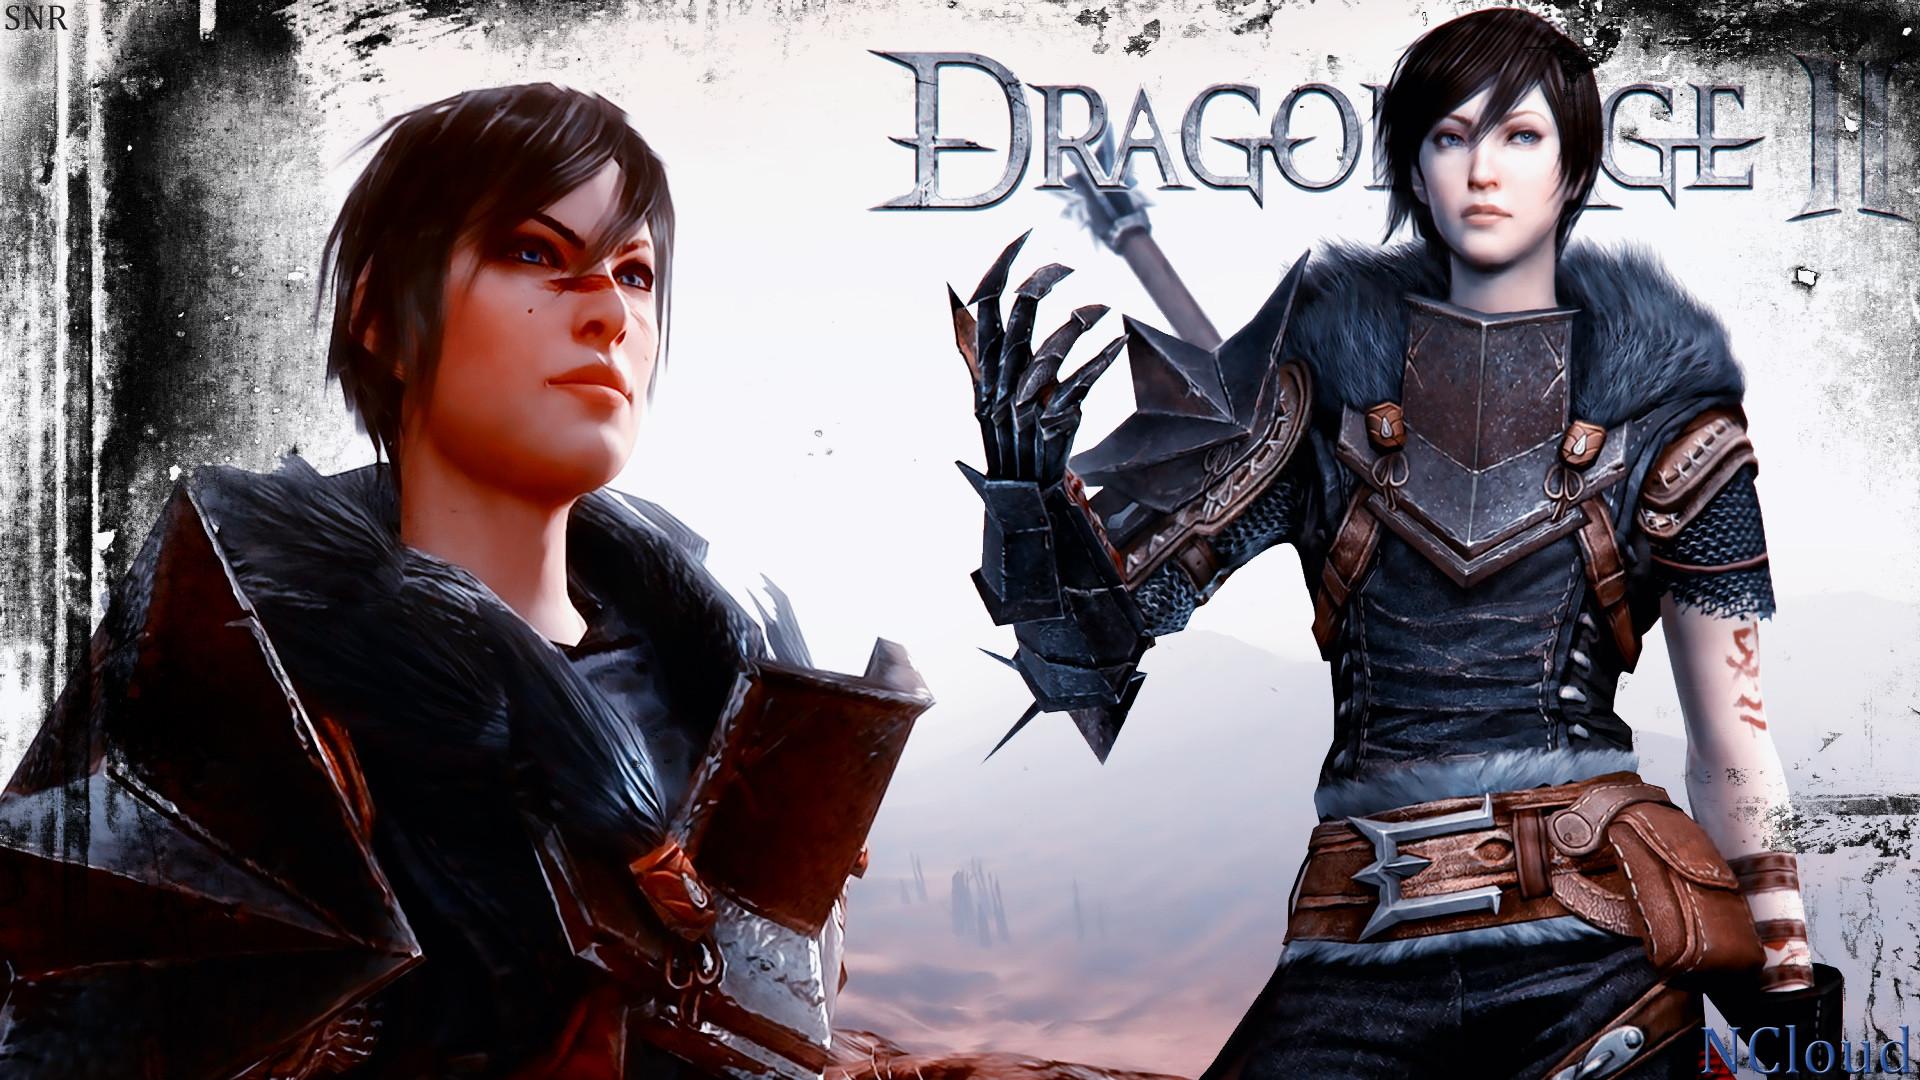 Games Movies Music Anime: My Dragon Age 2 Female Hawke Wallpaper 3